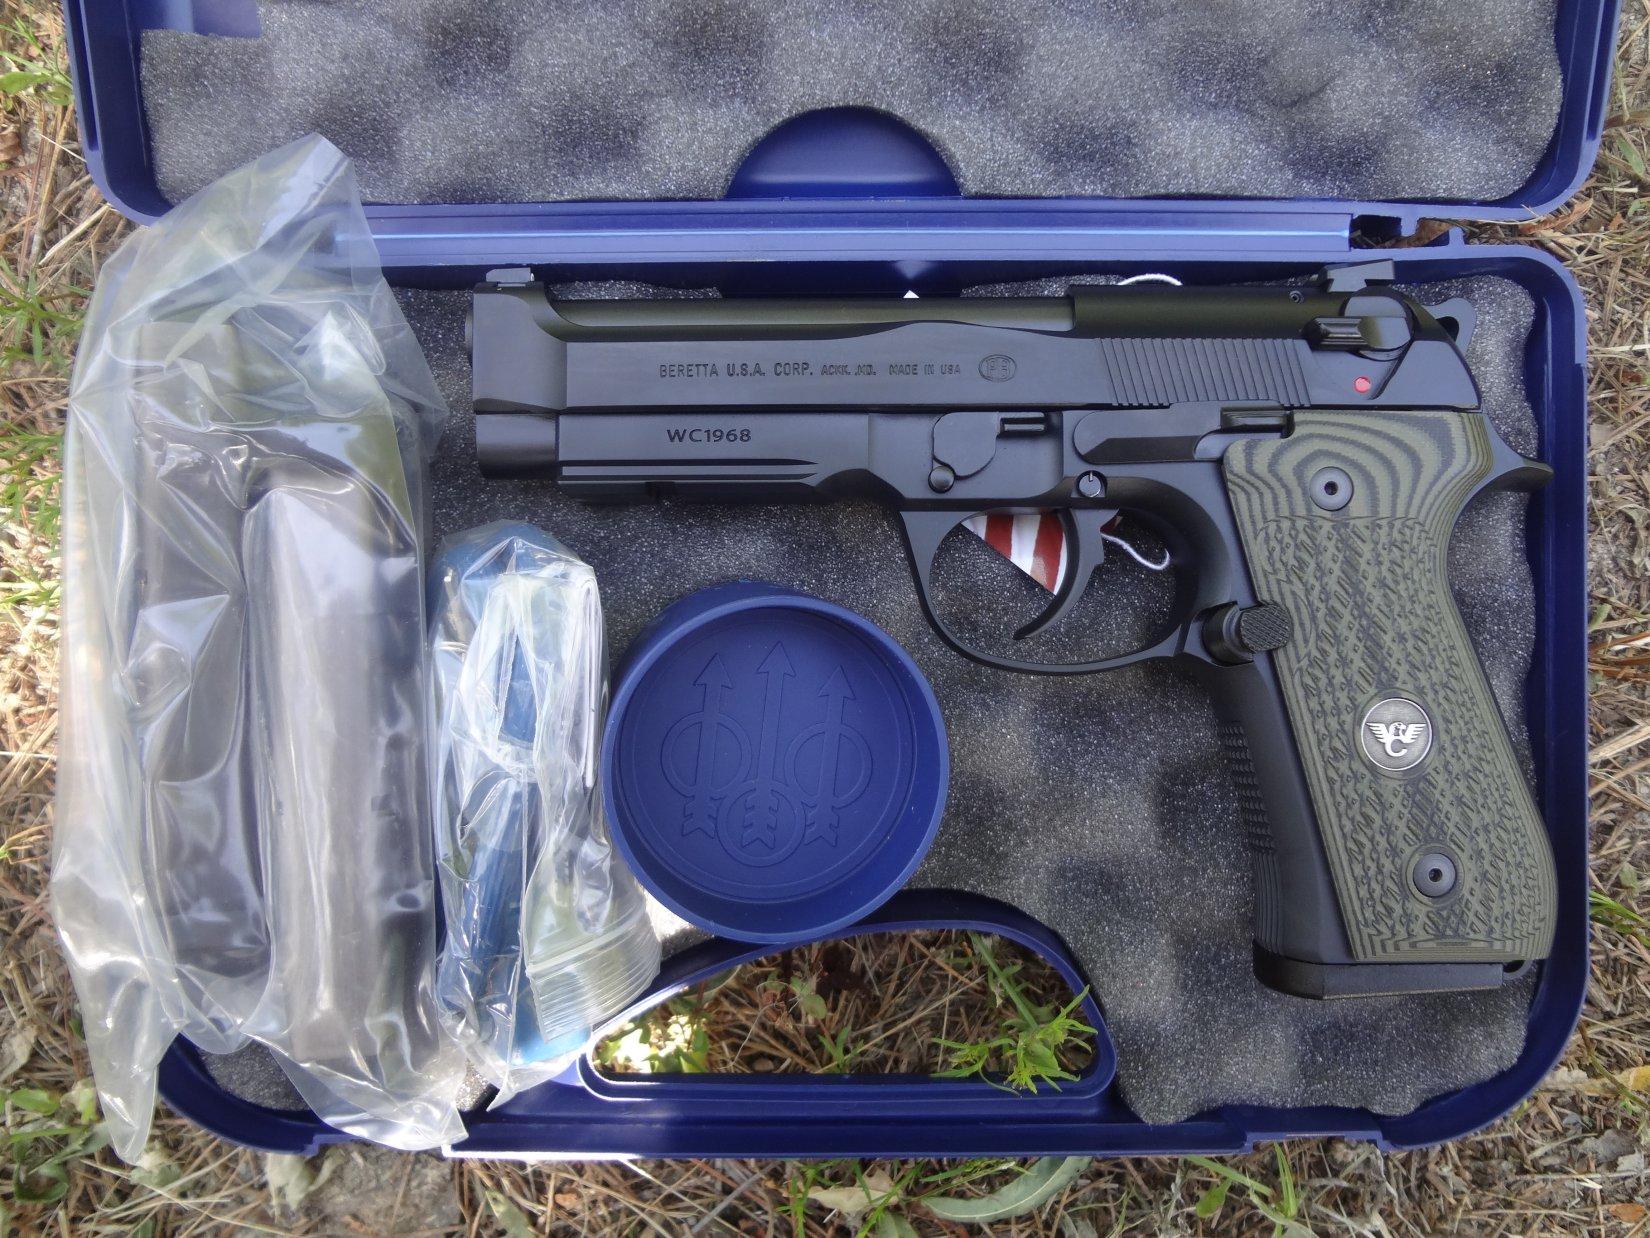 Beretta/Wilson Combat 92G Brigadier Tactical 9mm Semi-Auto